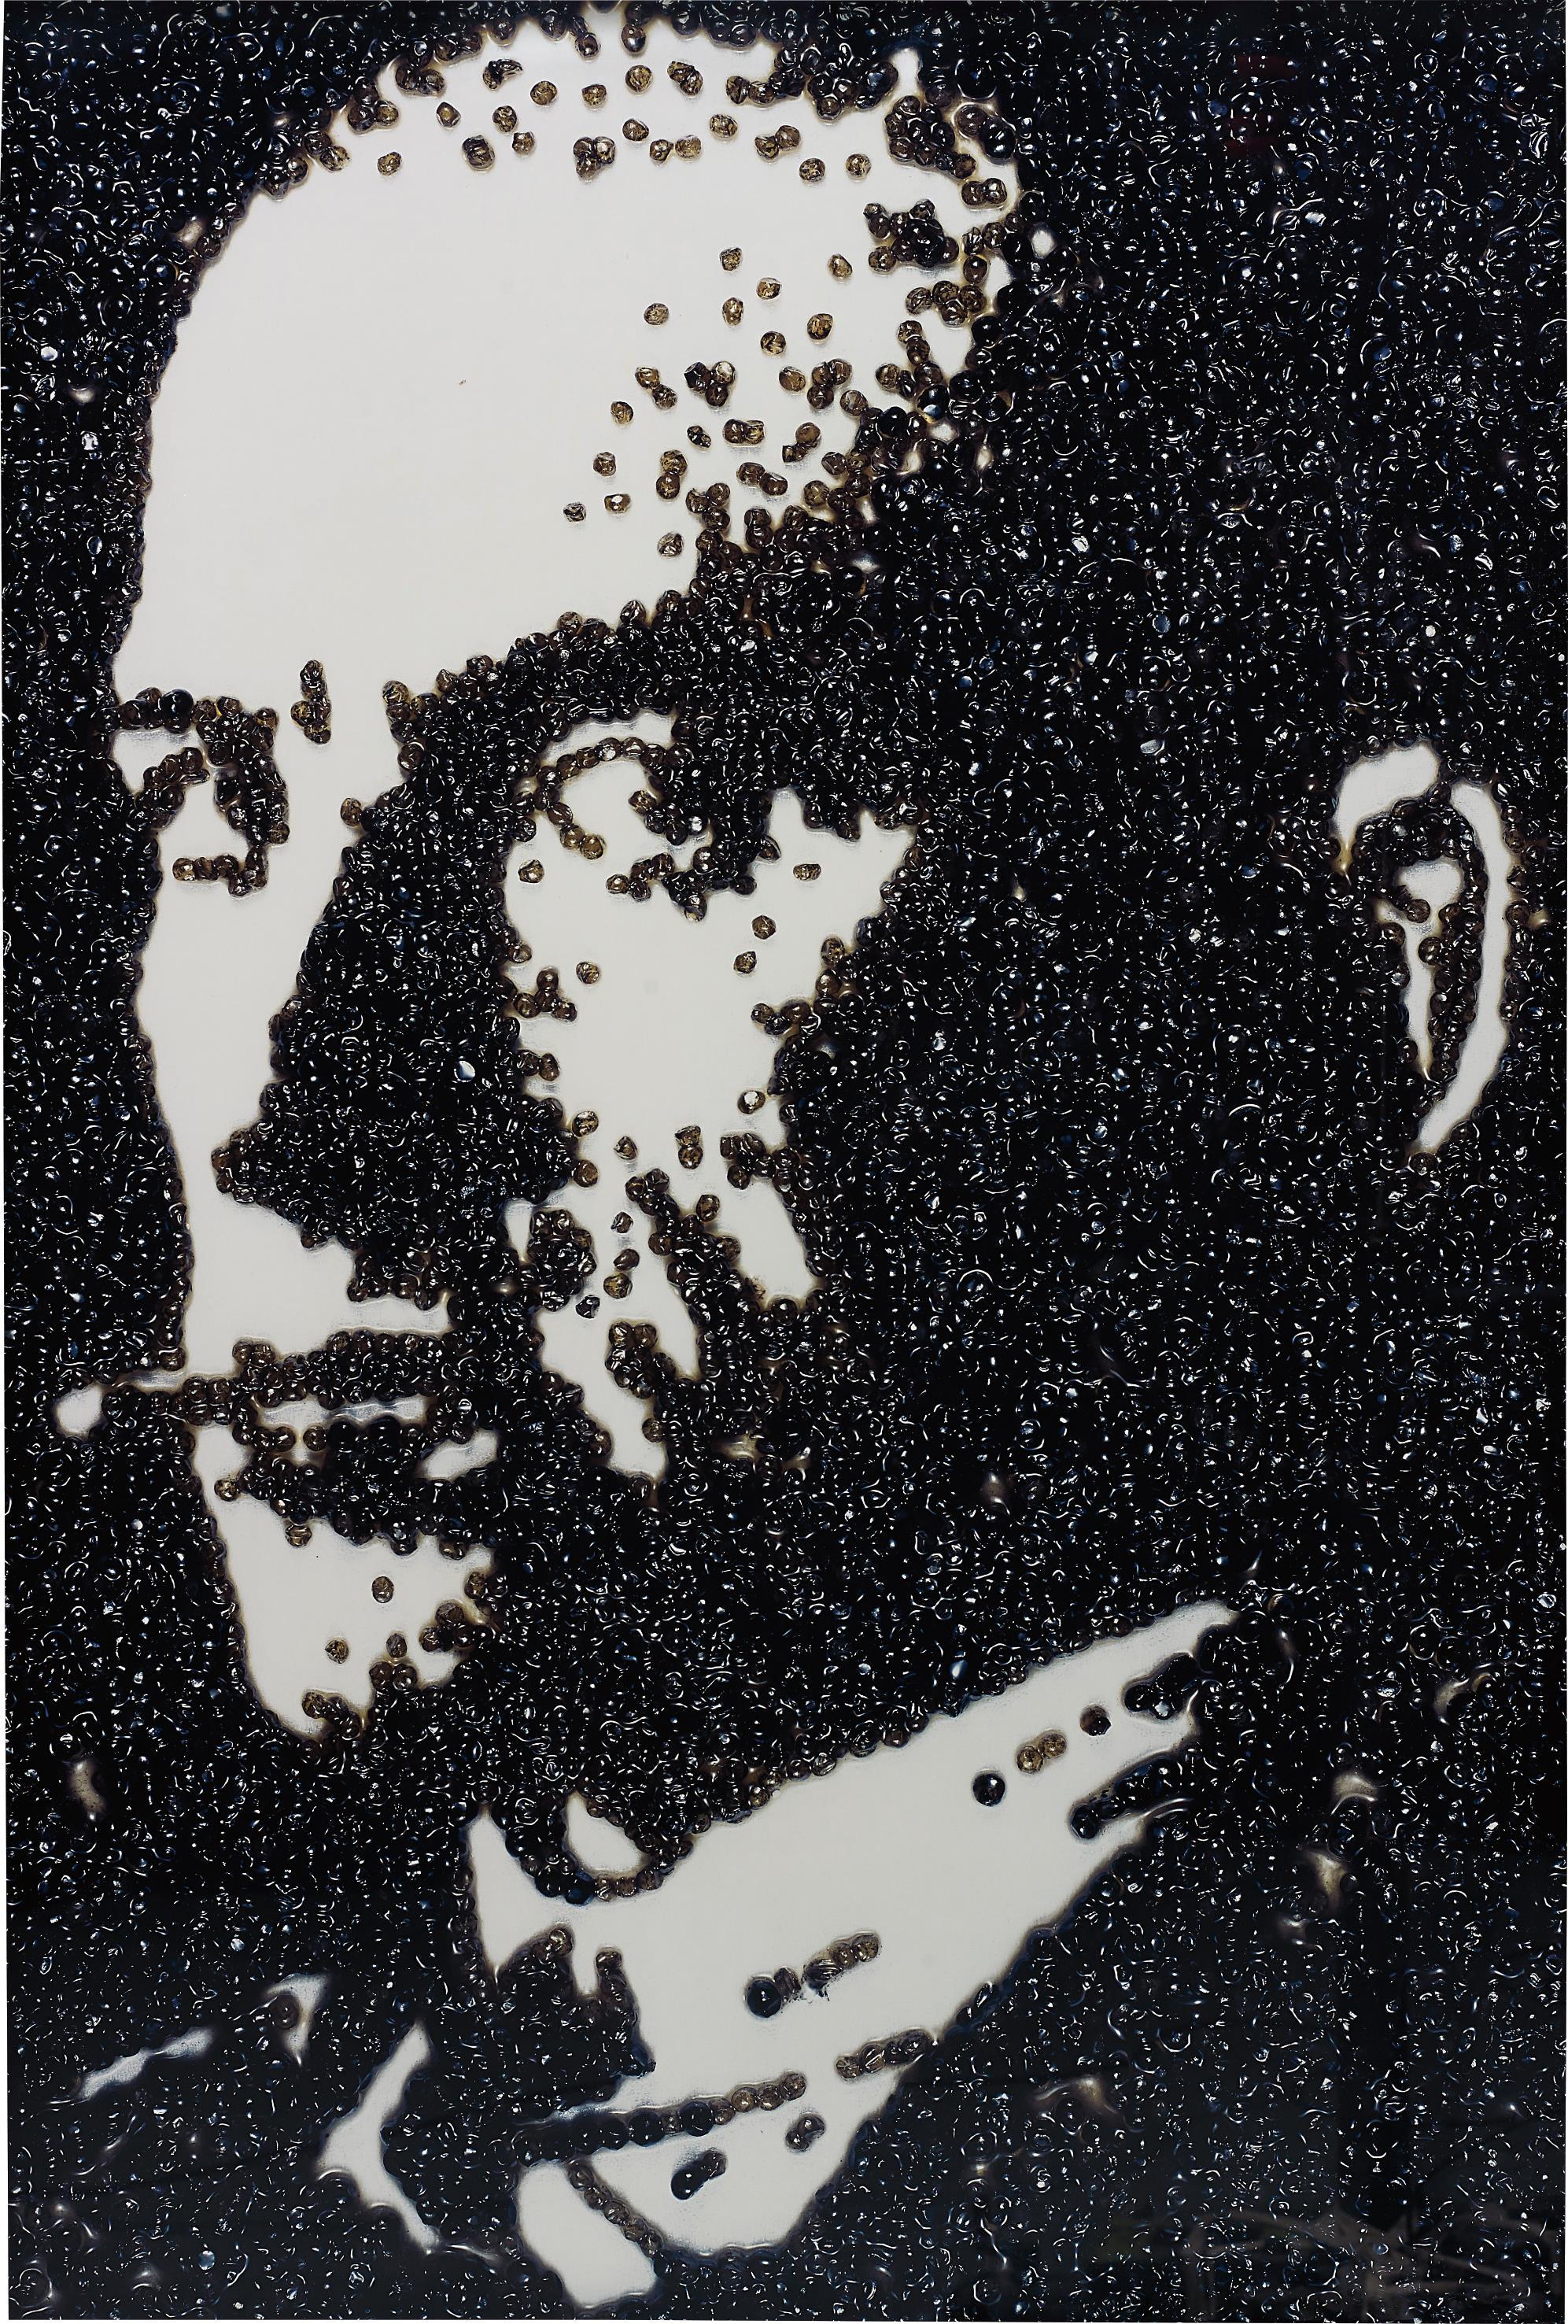 Vik Muniz-Maiakowskij, After Rodchenko (Pictures Of Caviar)-2004